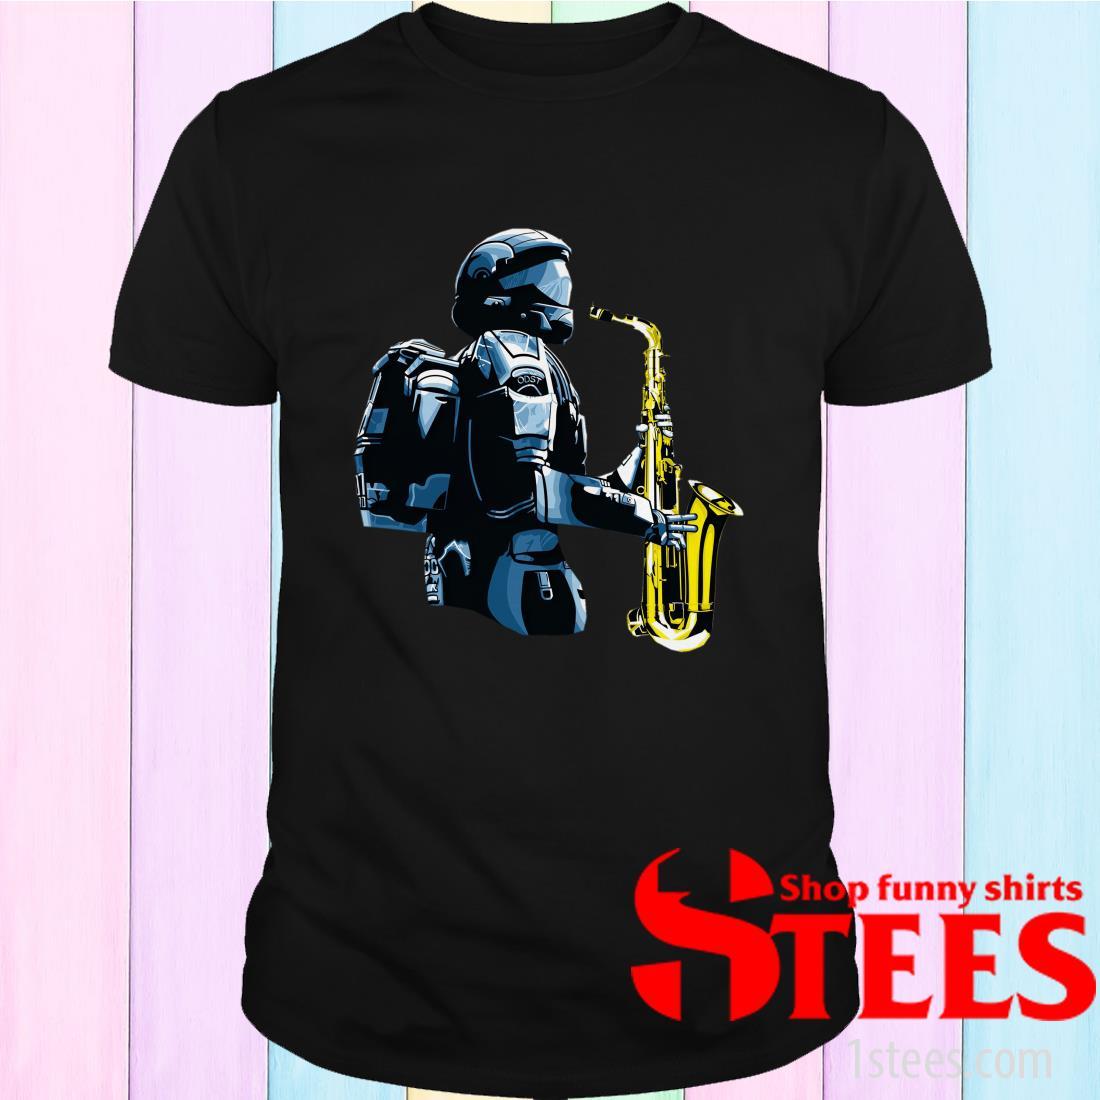 Halo 3 Odst Saxophone Shirt